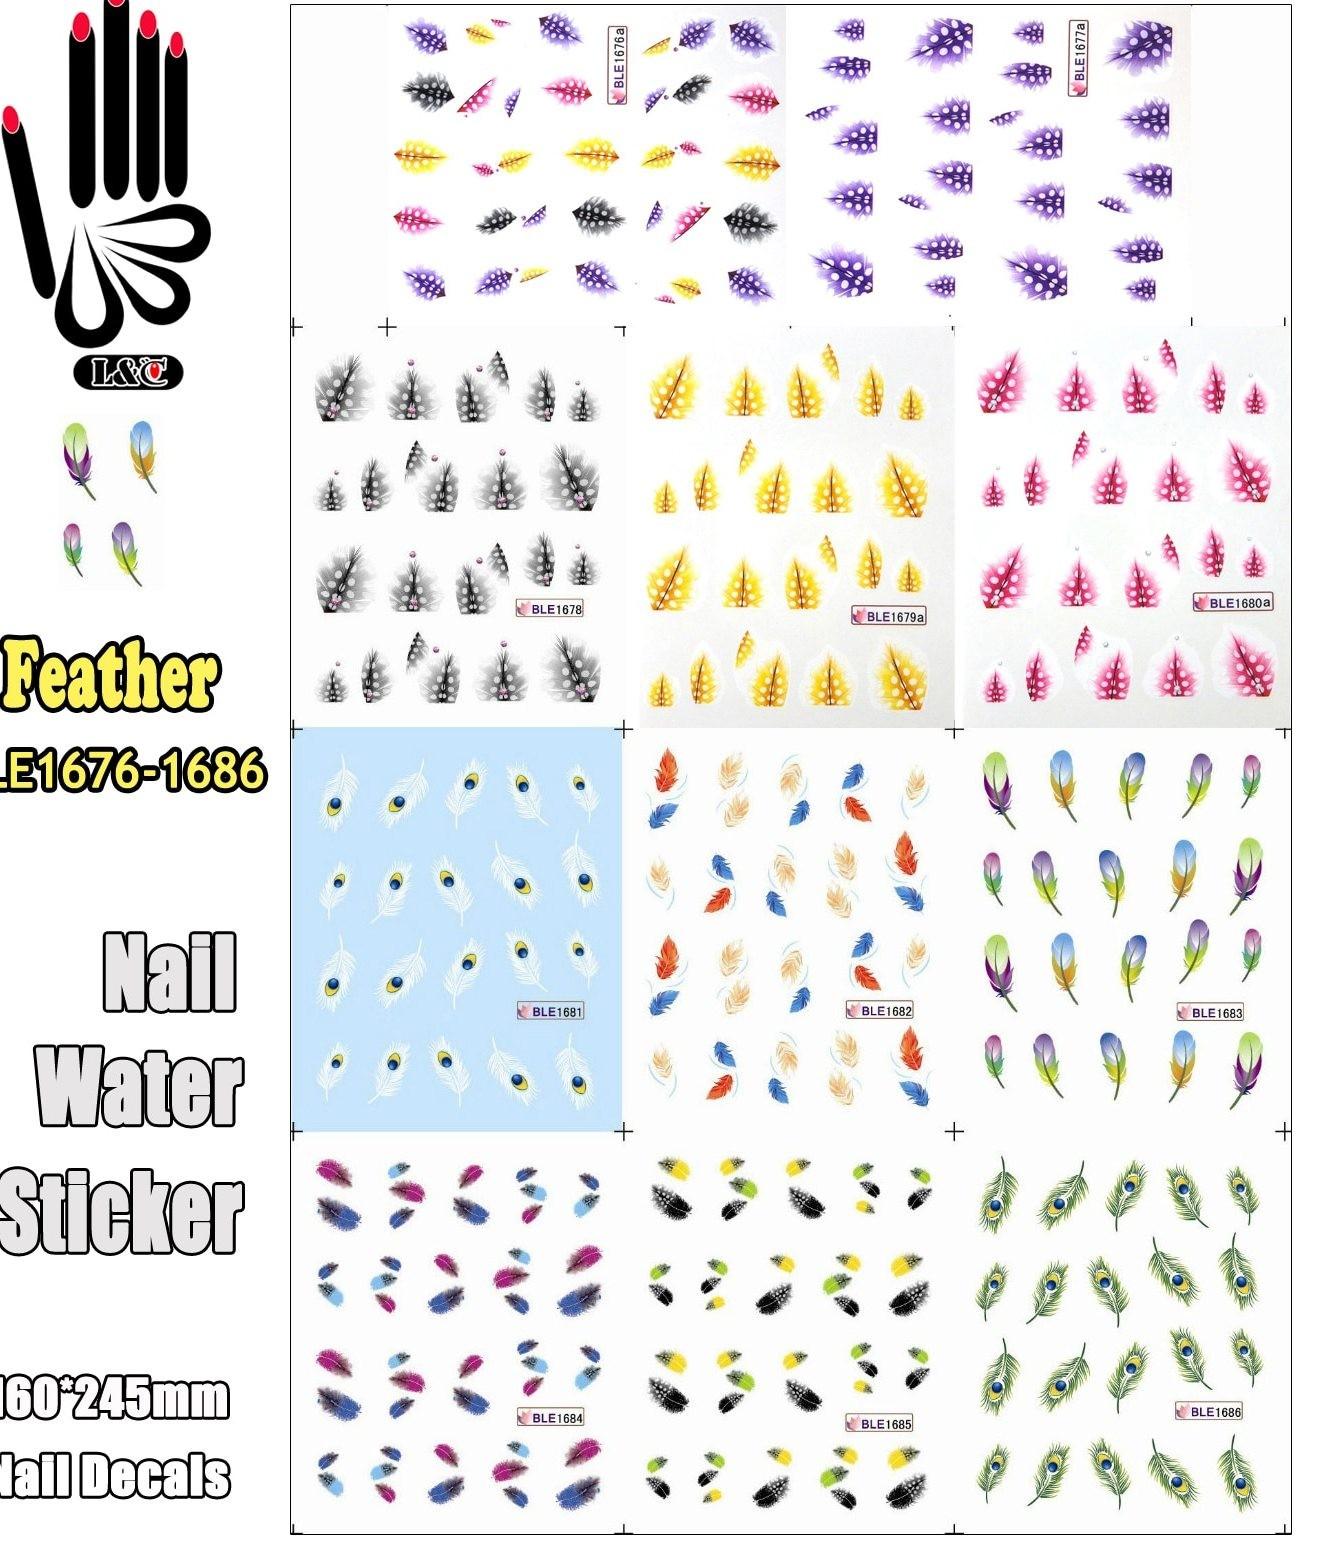 Calendario 2017 Para Imprimir Rj Más Recientes ツ ¯11 Sábanas Lot Manicura Ble1676a 1686 Colorido Plumas Manicura